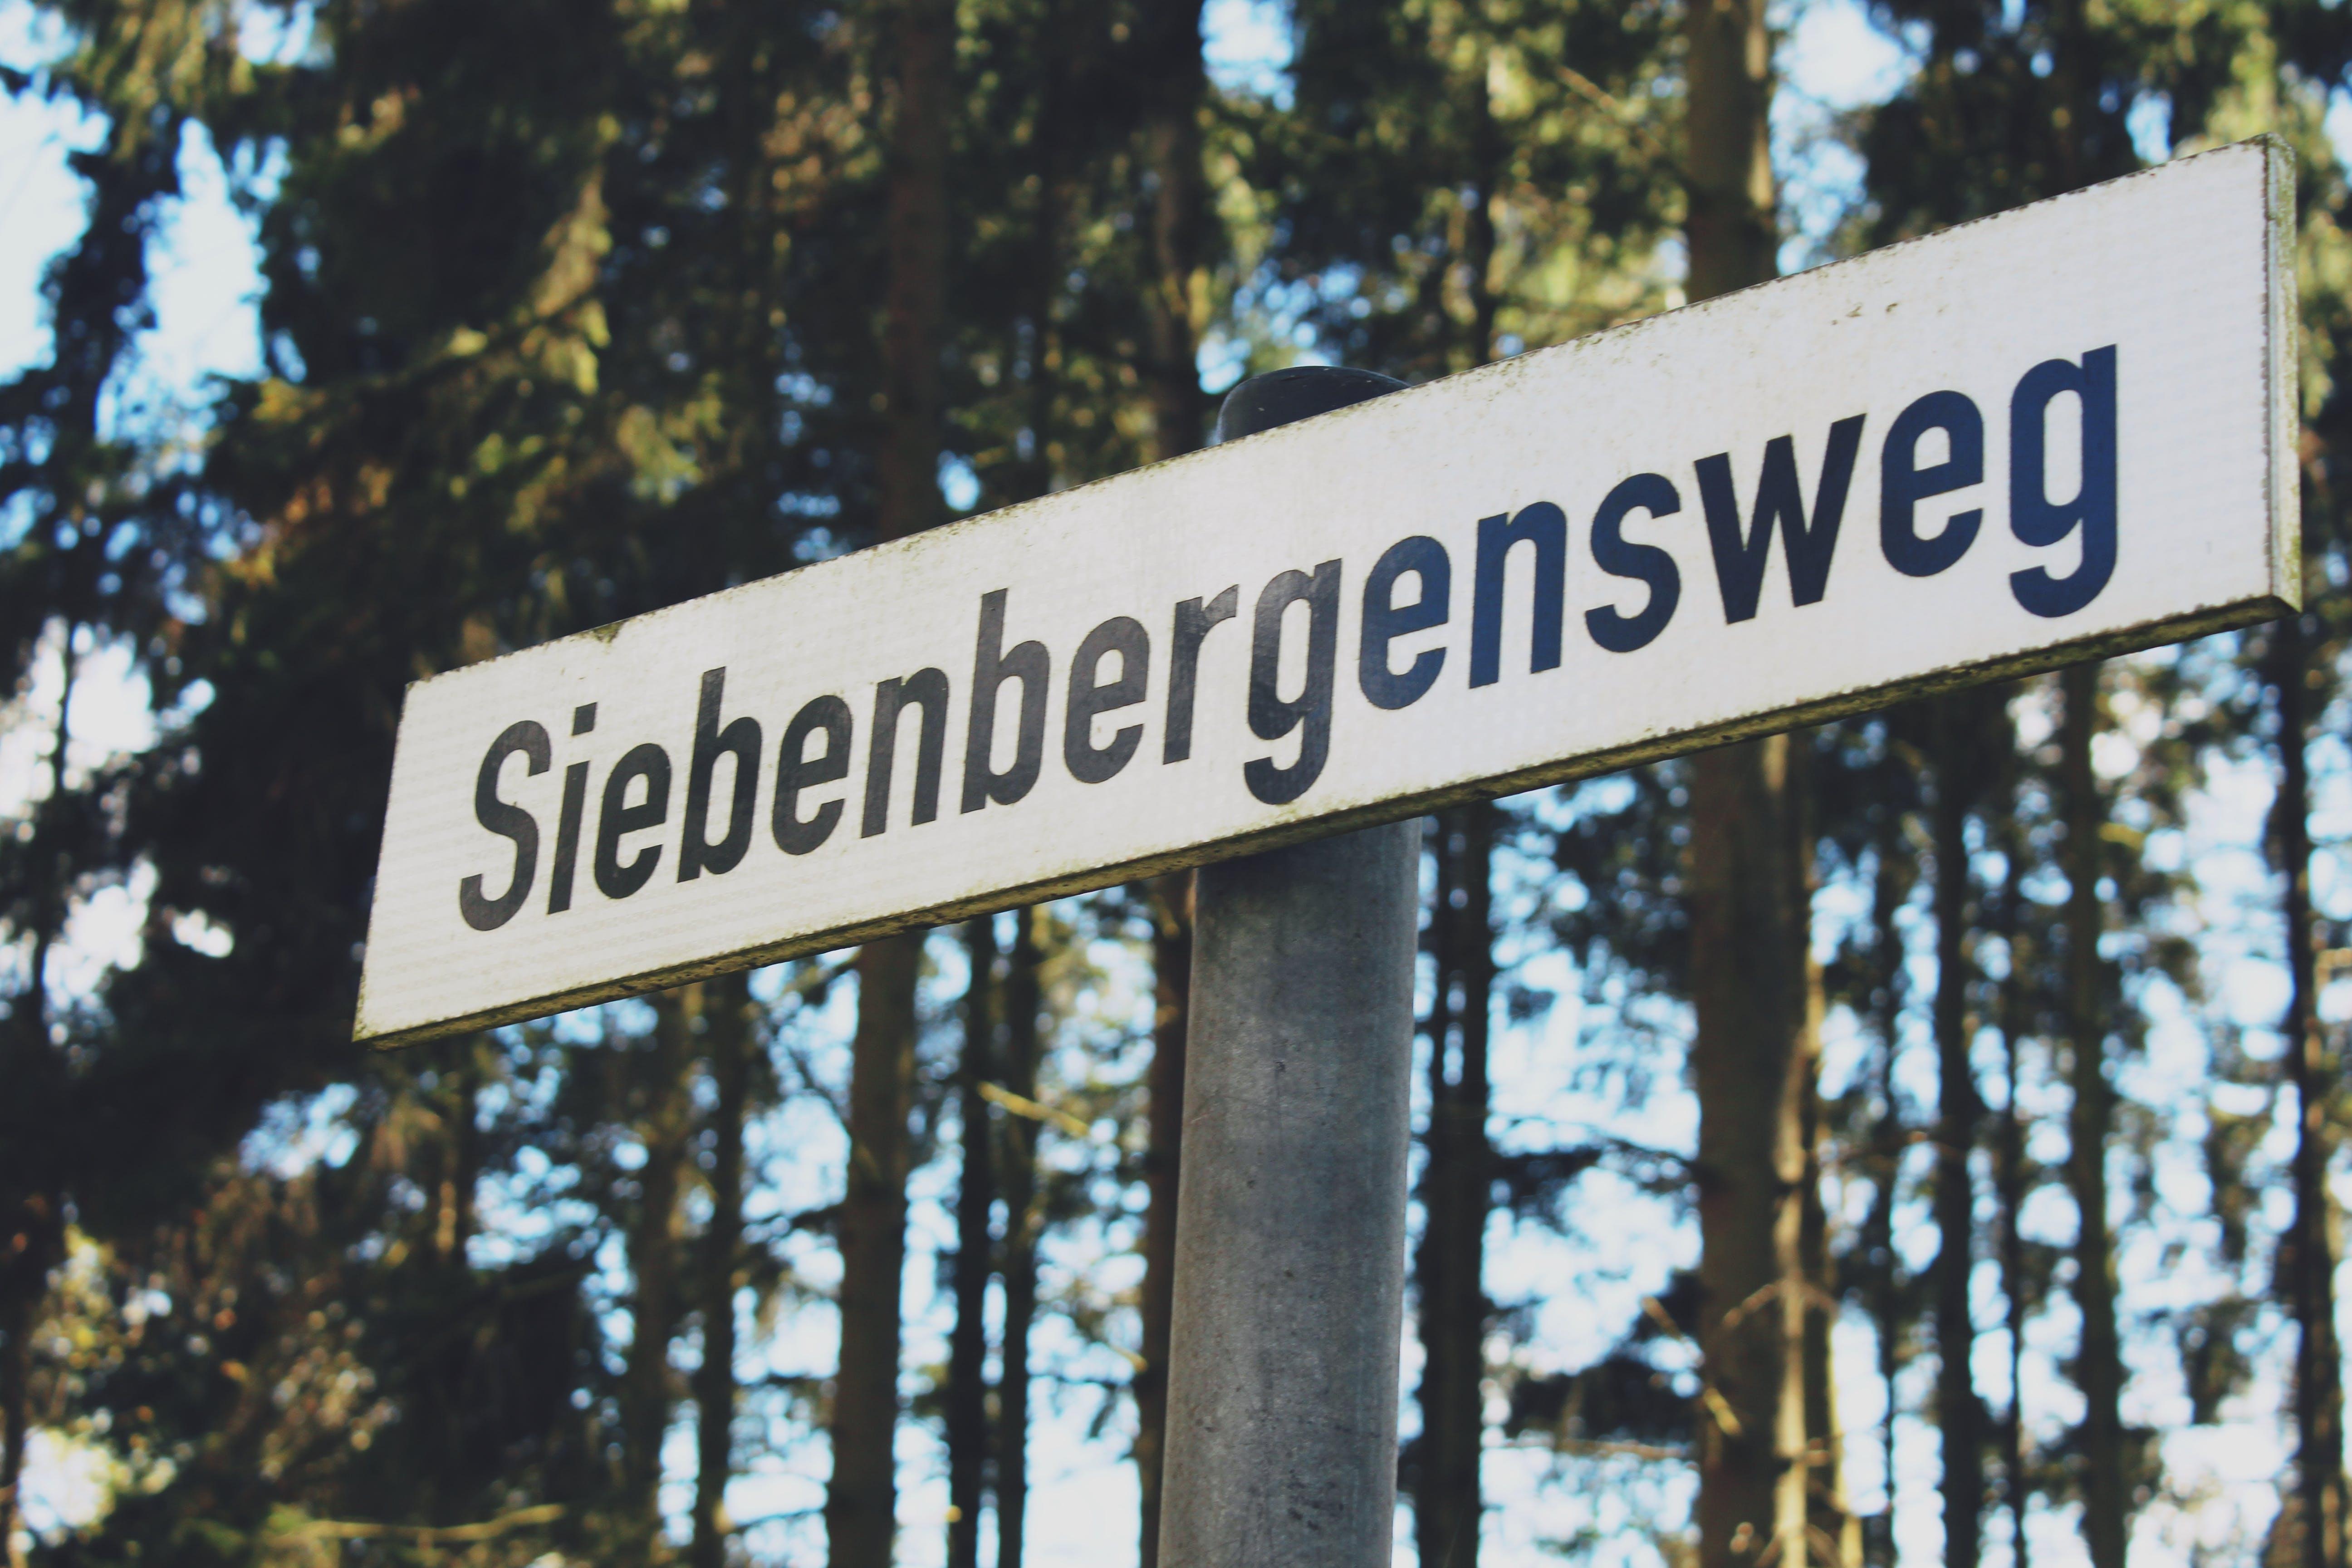 White and Black Siebenbergensweg Wooden Signage